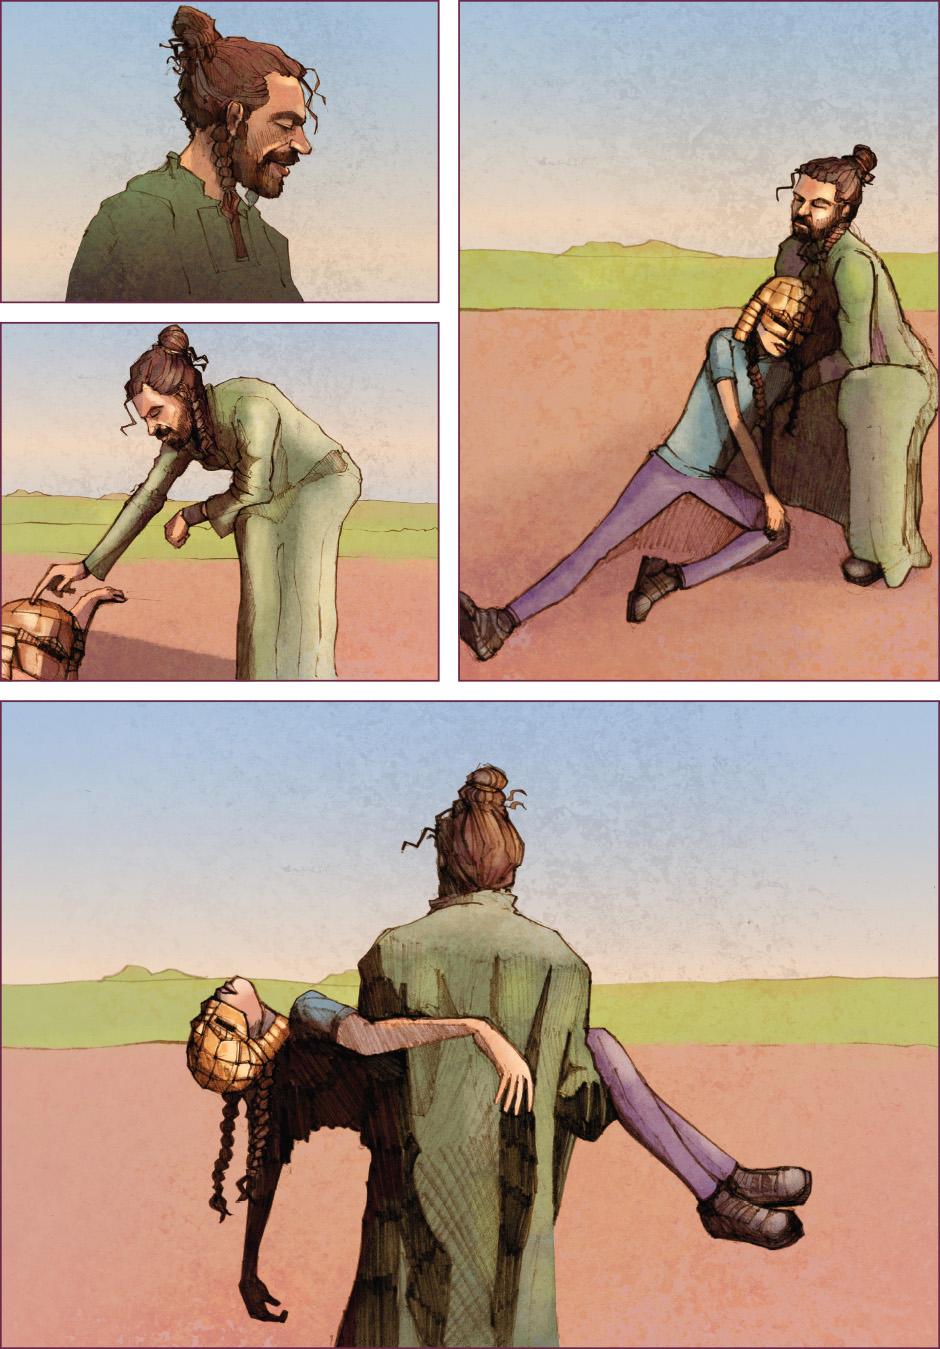 Lian Webcomic, The Tree of Life, chapter 2. Wilbur taking Lian away